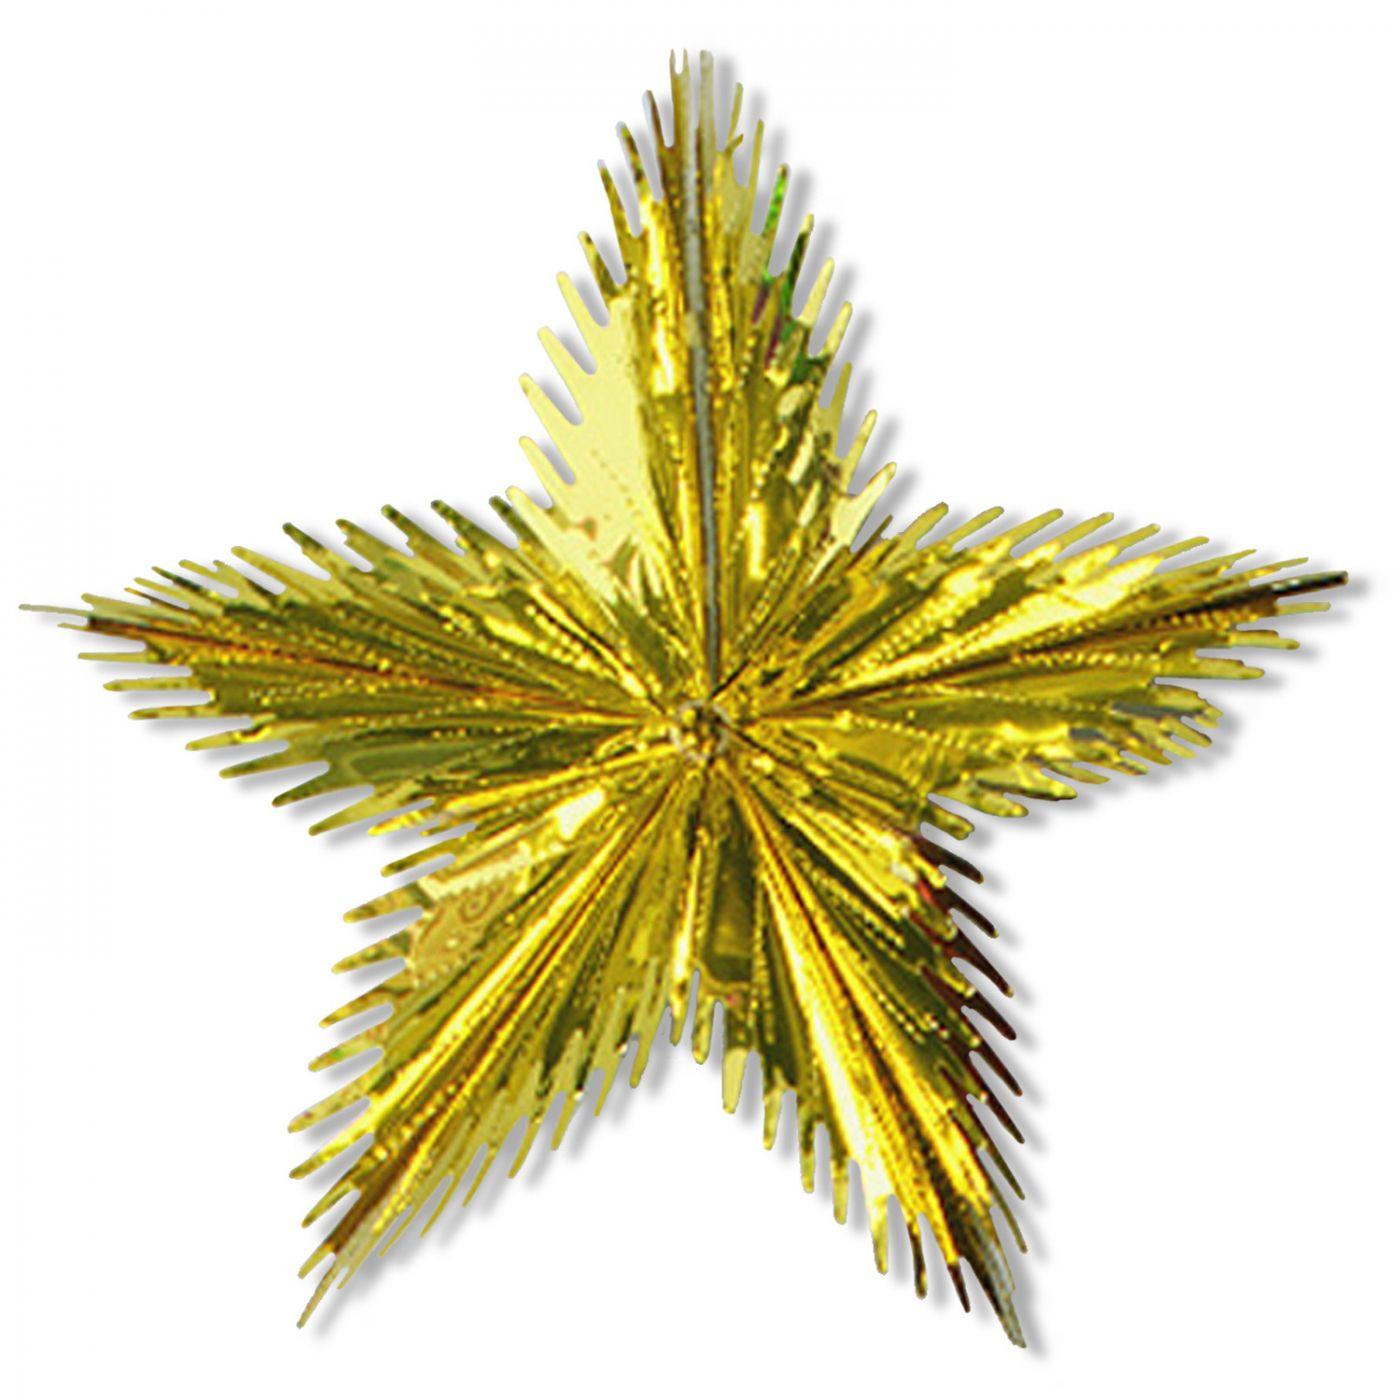 Leaf Starburst image